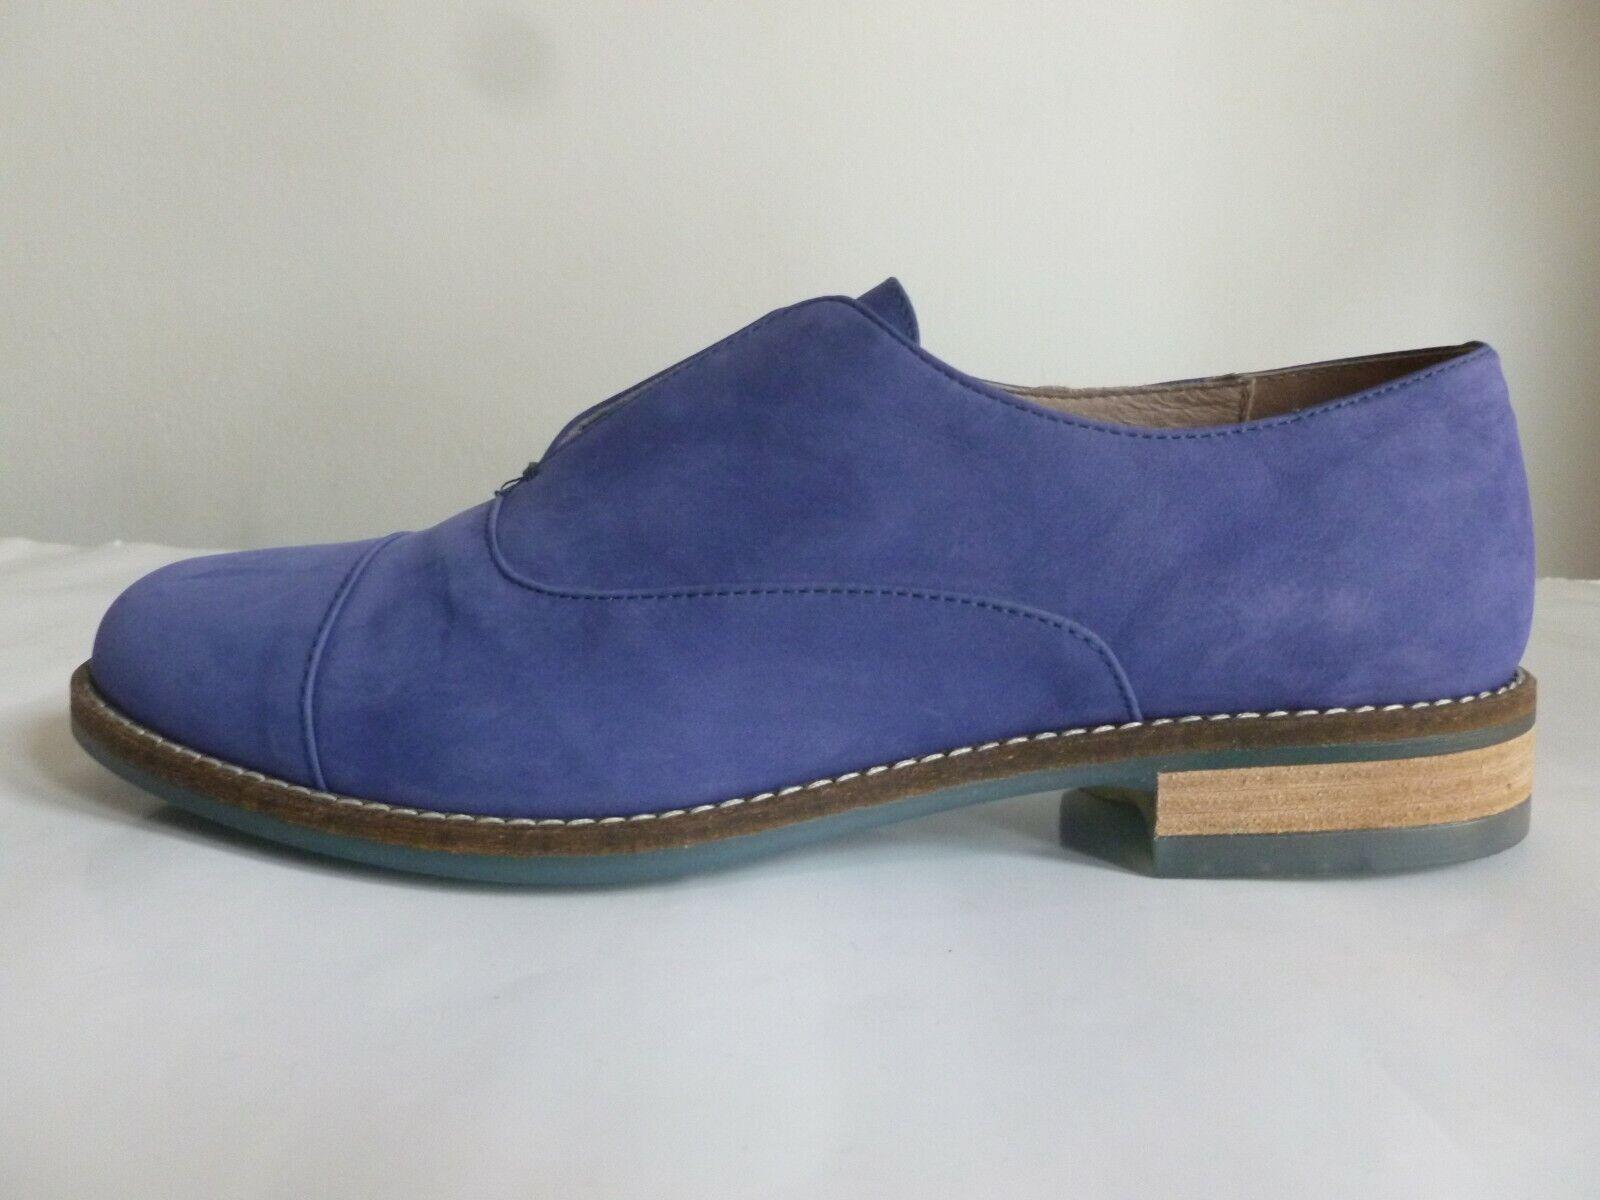 New leather derby scarpe PENNY nero 37 EU, scarpe derby PENNY nero tg 37 NUOVE